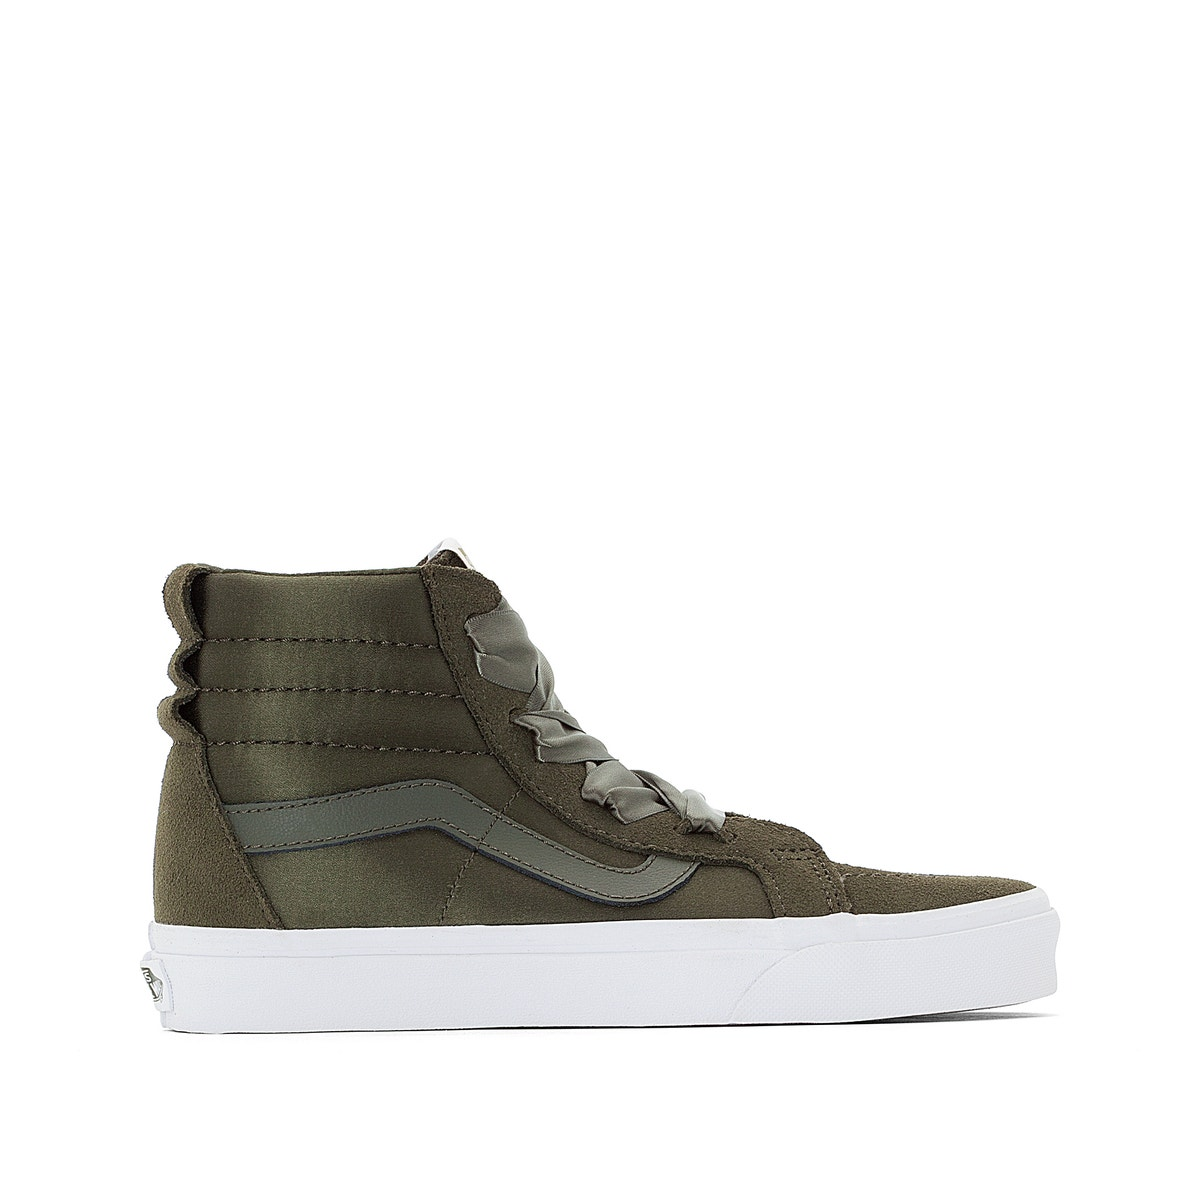 Vans - Vans 350125783 Sneakers UA SK8-Hi Alt Lace - 5637 laredoute   γυναικεια   sneakers   mid cut